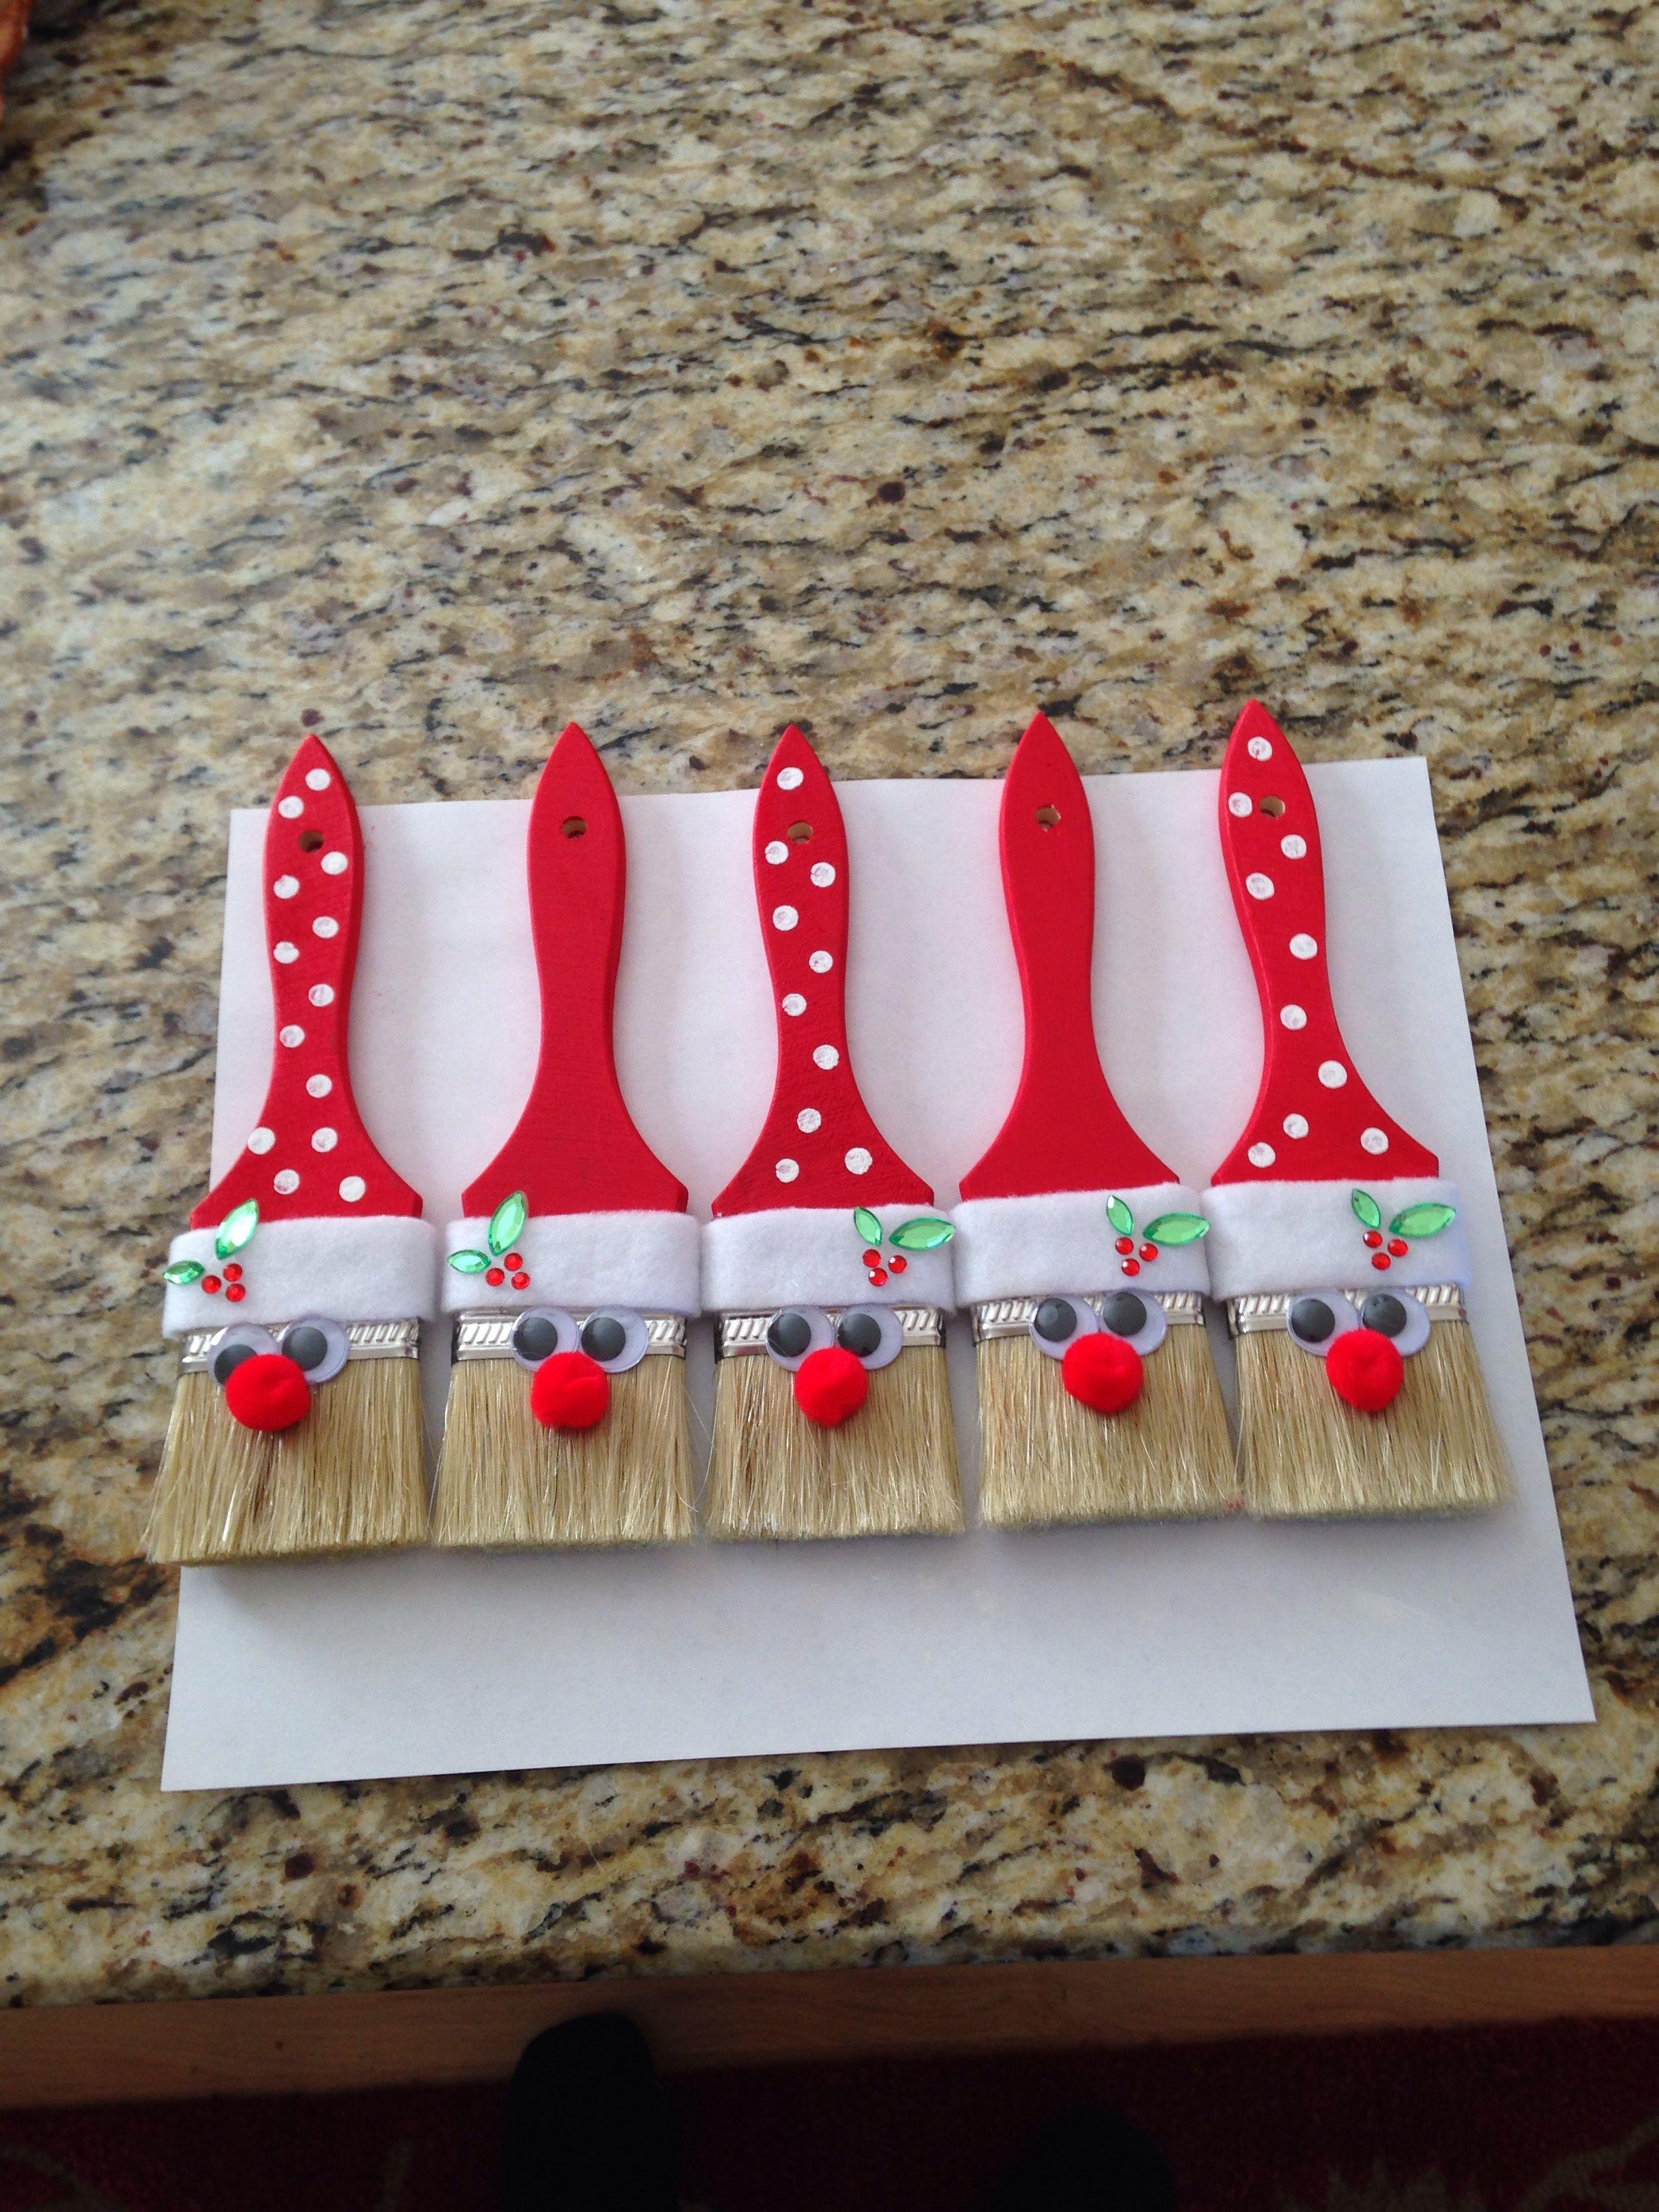 Santa Paint Brush Ornaments They Look So Cool I Think I